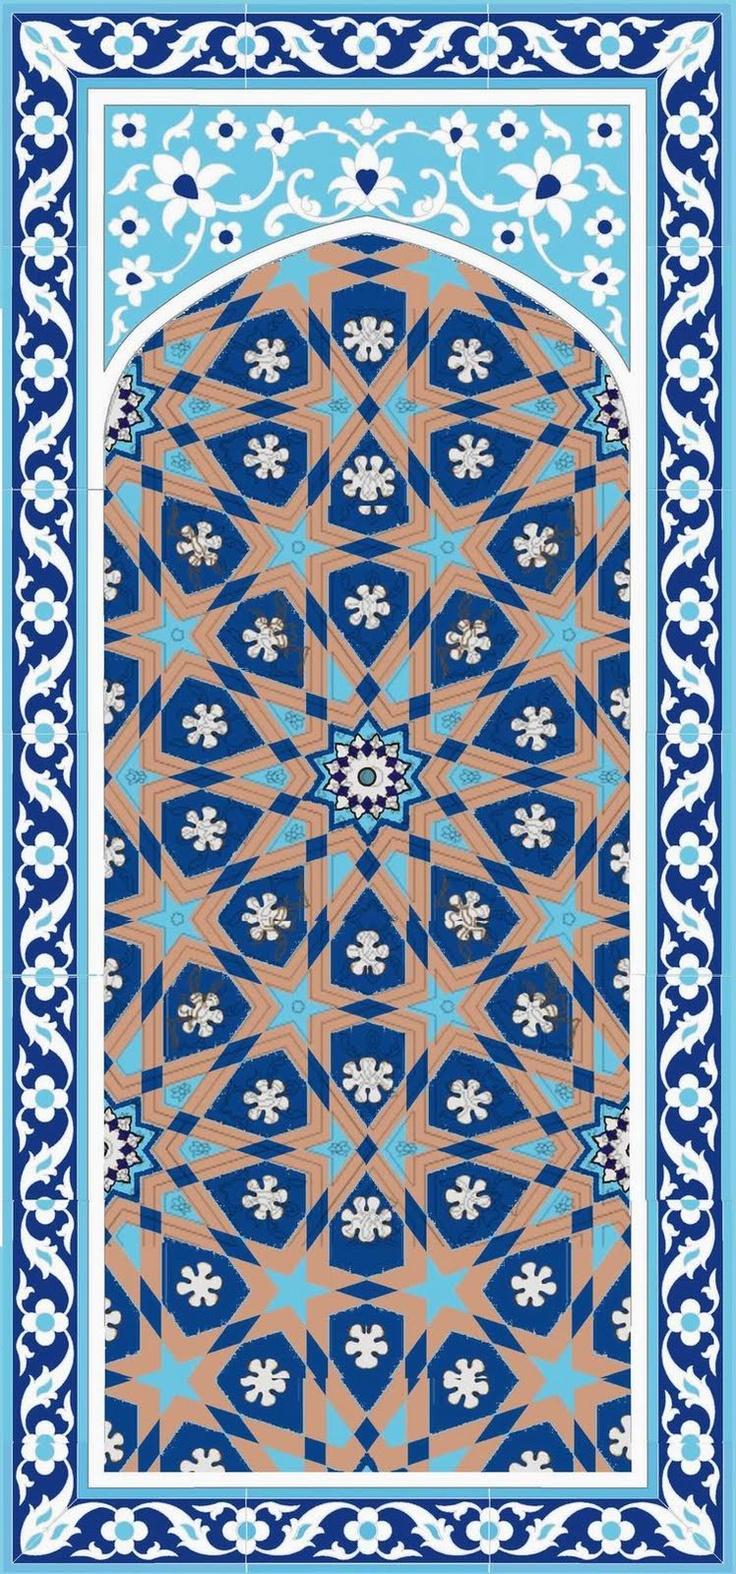 â œvegetal pattern in islamic artâ 26,090 islamic window stock photos, vectors, and illustrations are iran â september 18, 2014 vector islamic windows art pattern in eastern style.